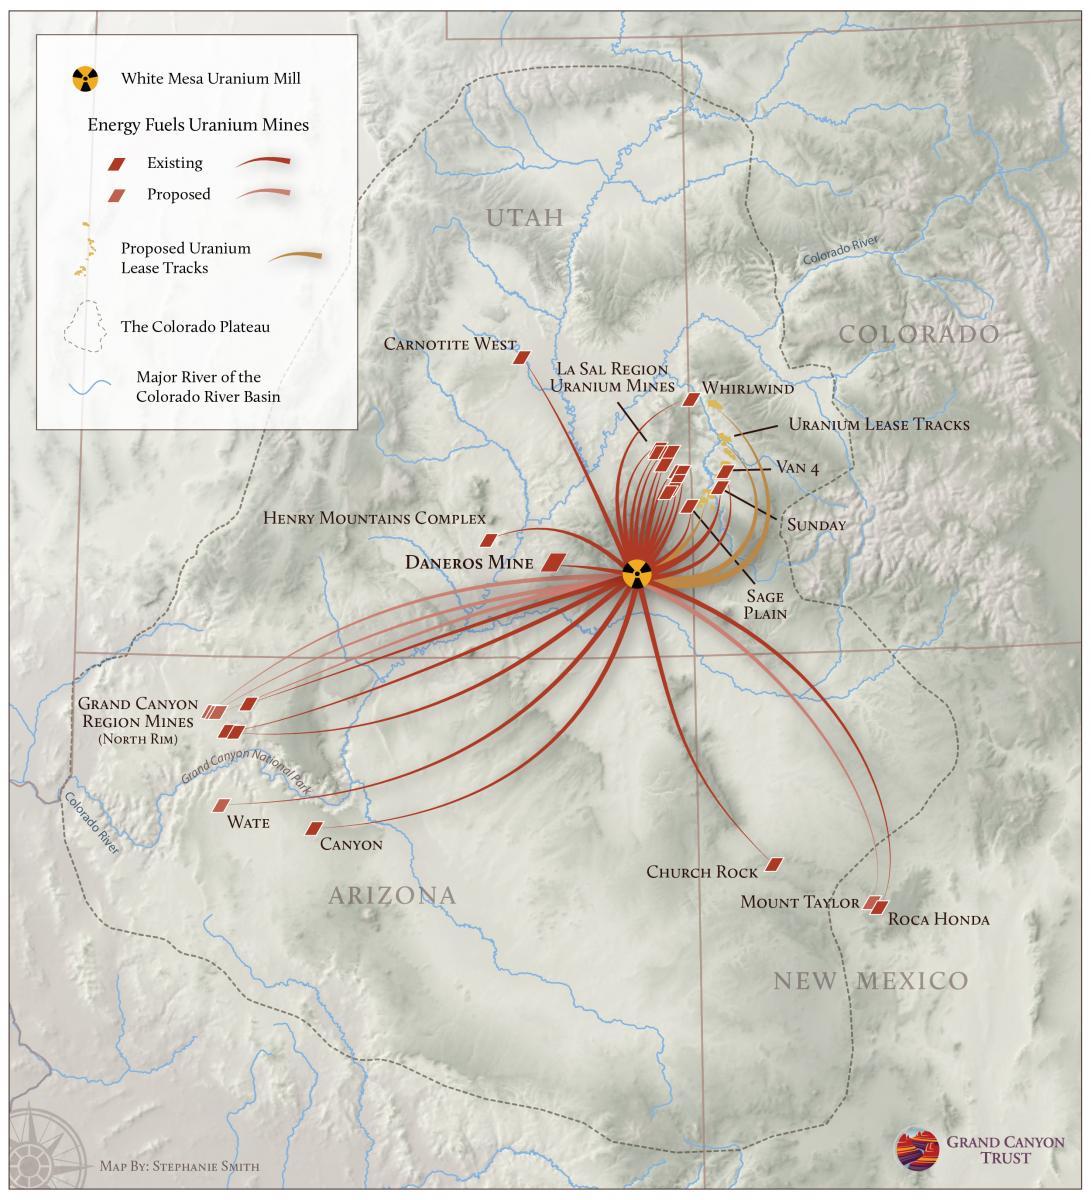 map_energyfuels_uraniummines